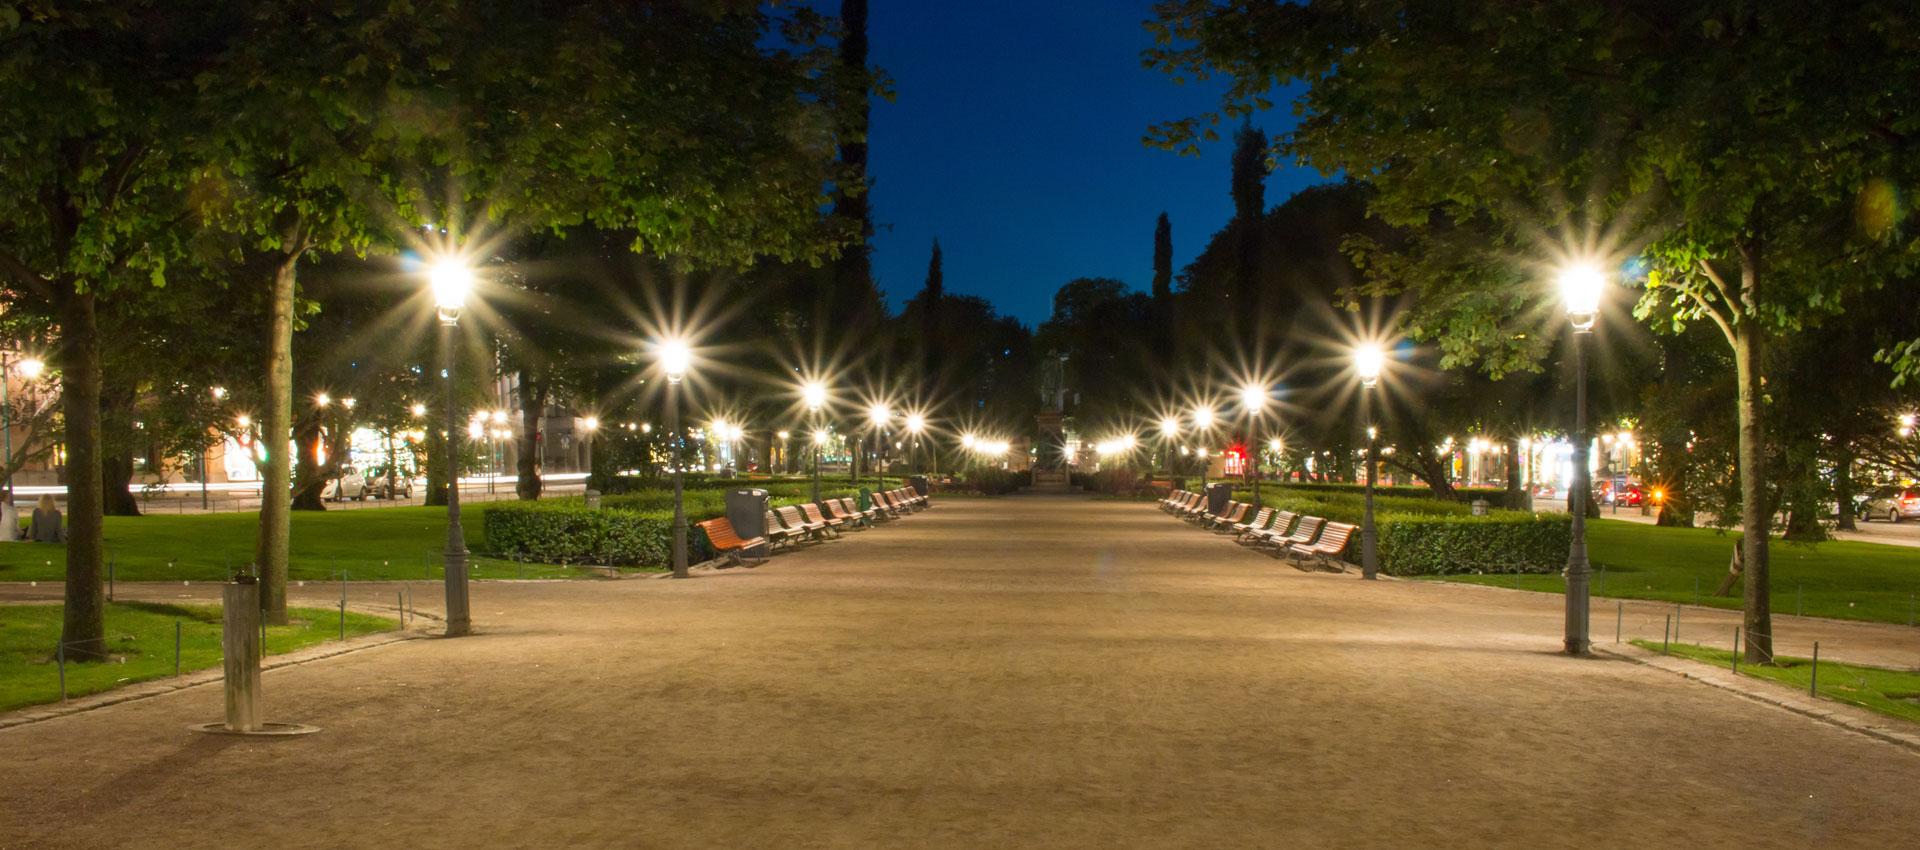 Led Landscape Lighting Kits Tellco Europe